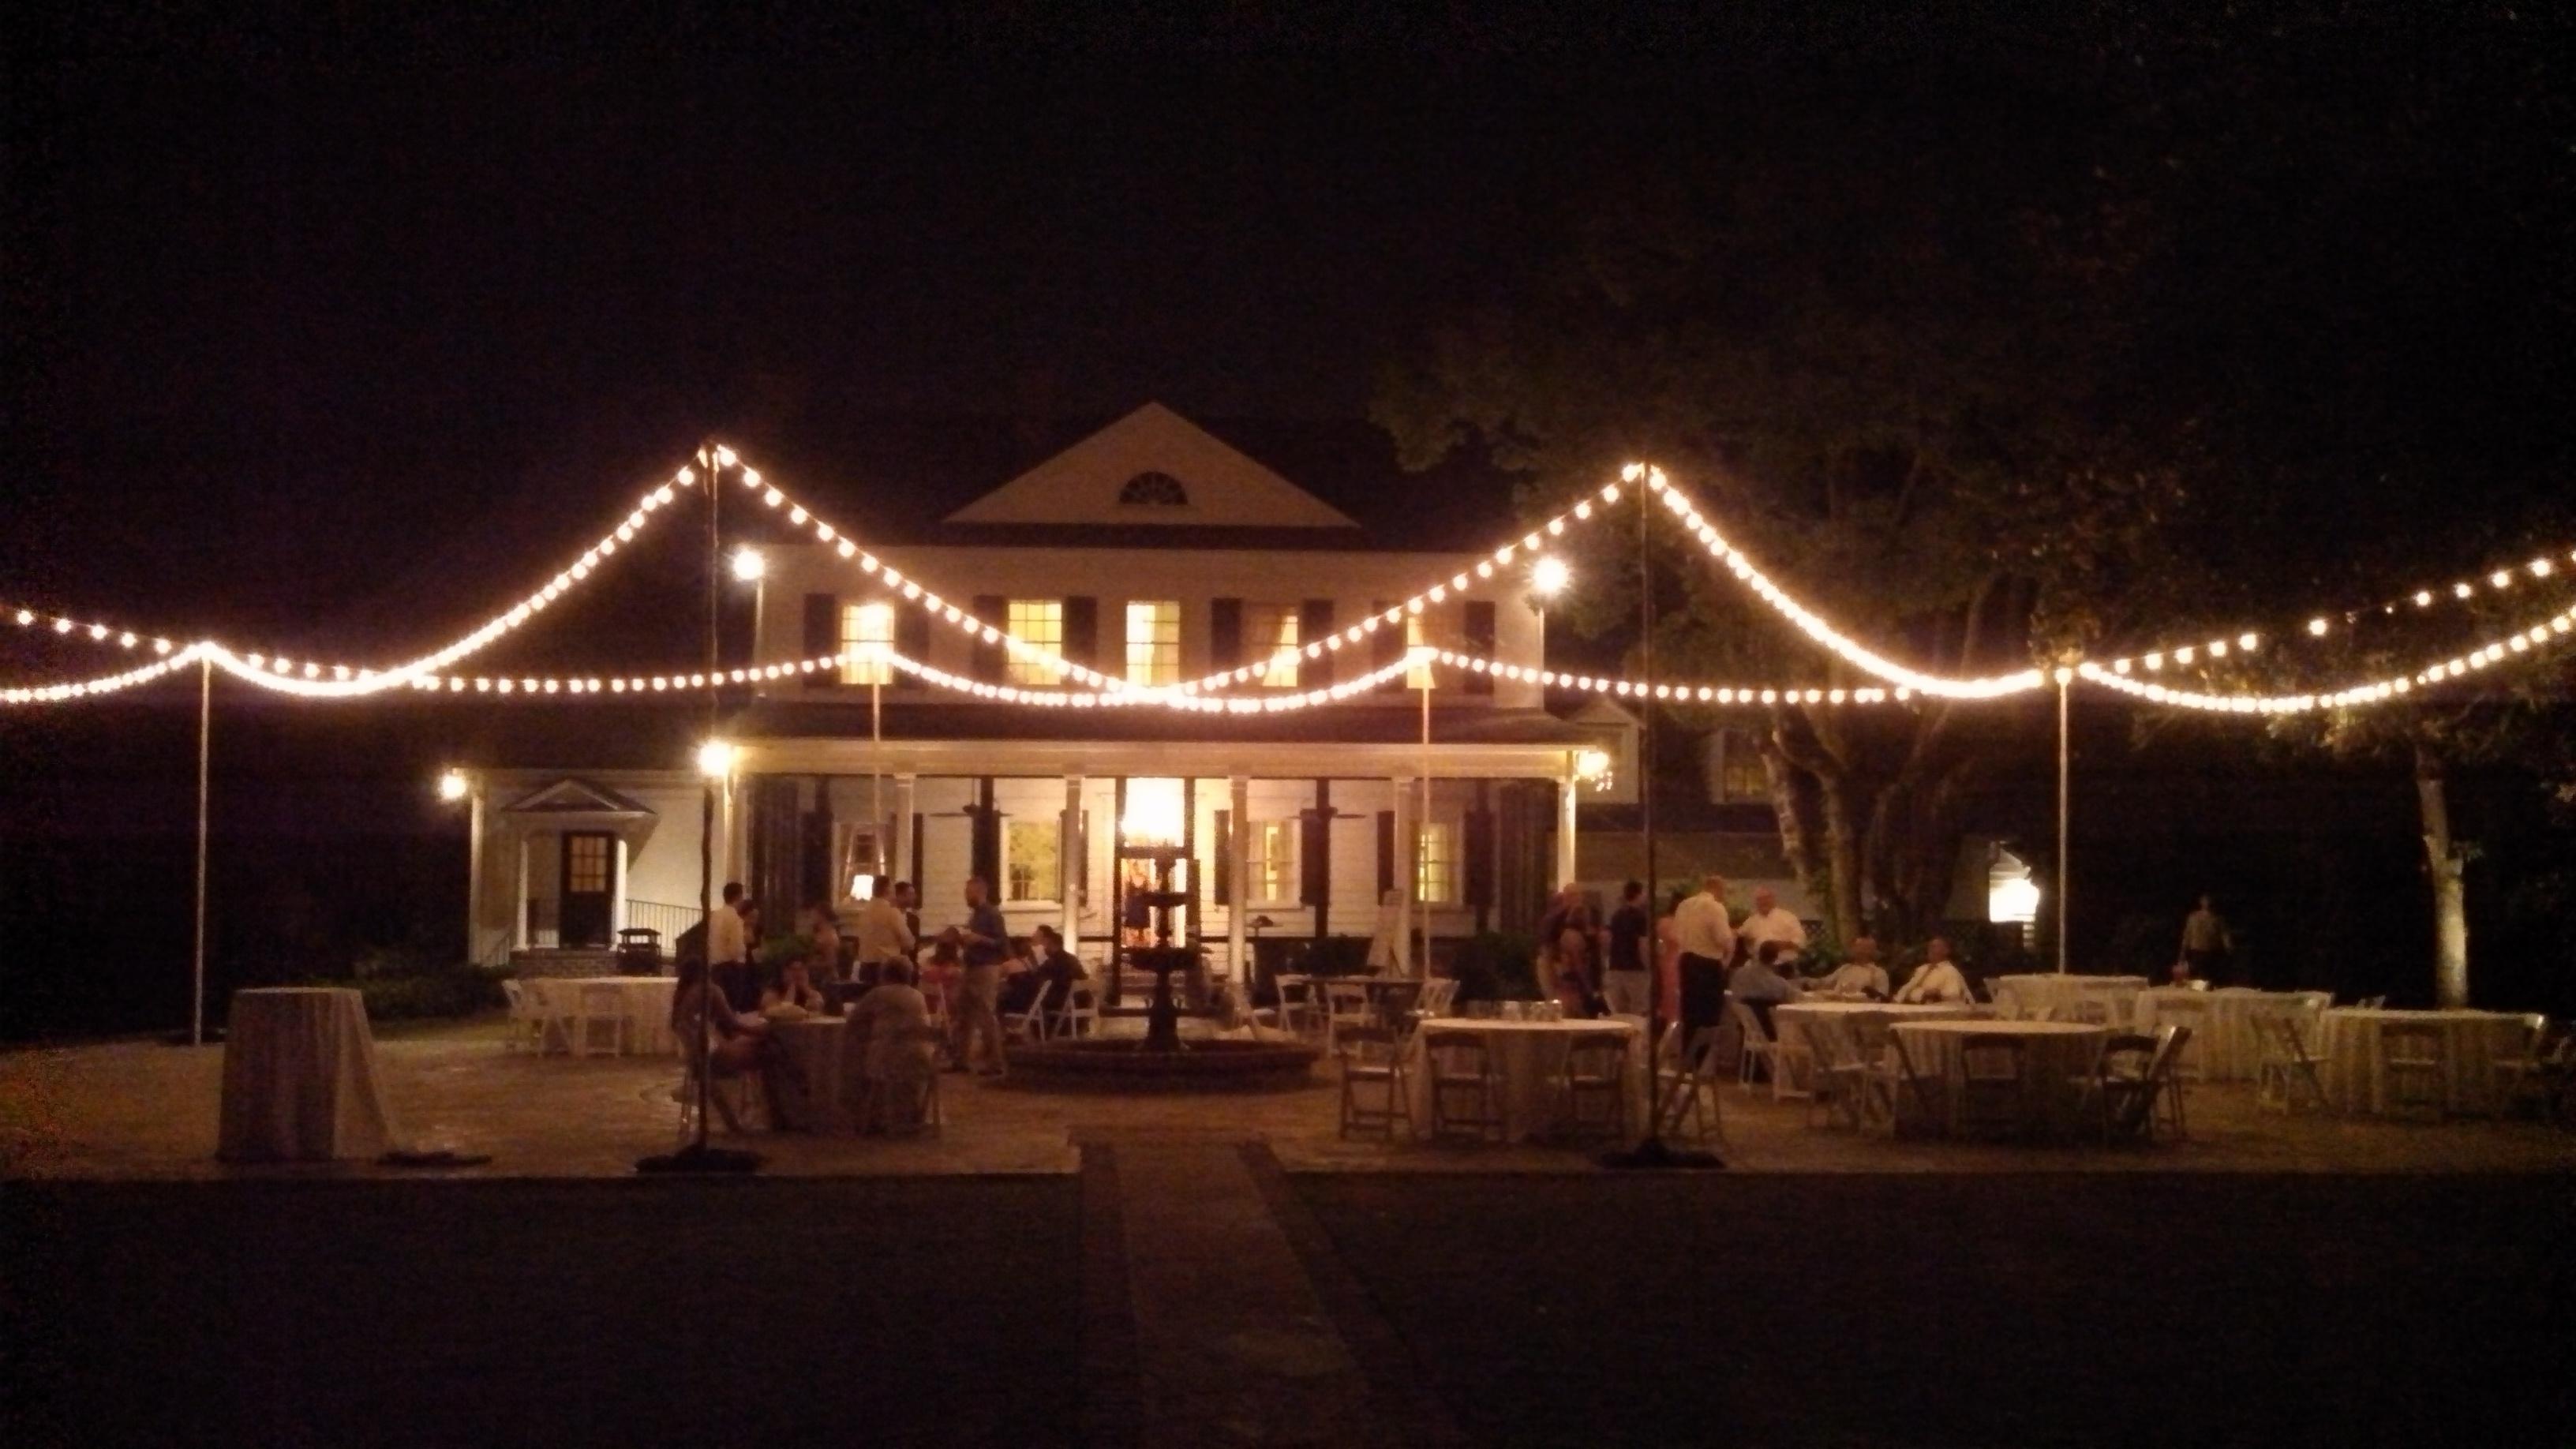 outdoor specialty lighting rental ncav connections, inc. Specialty Lighting